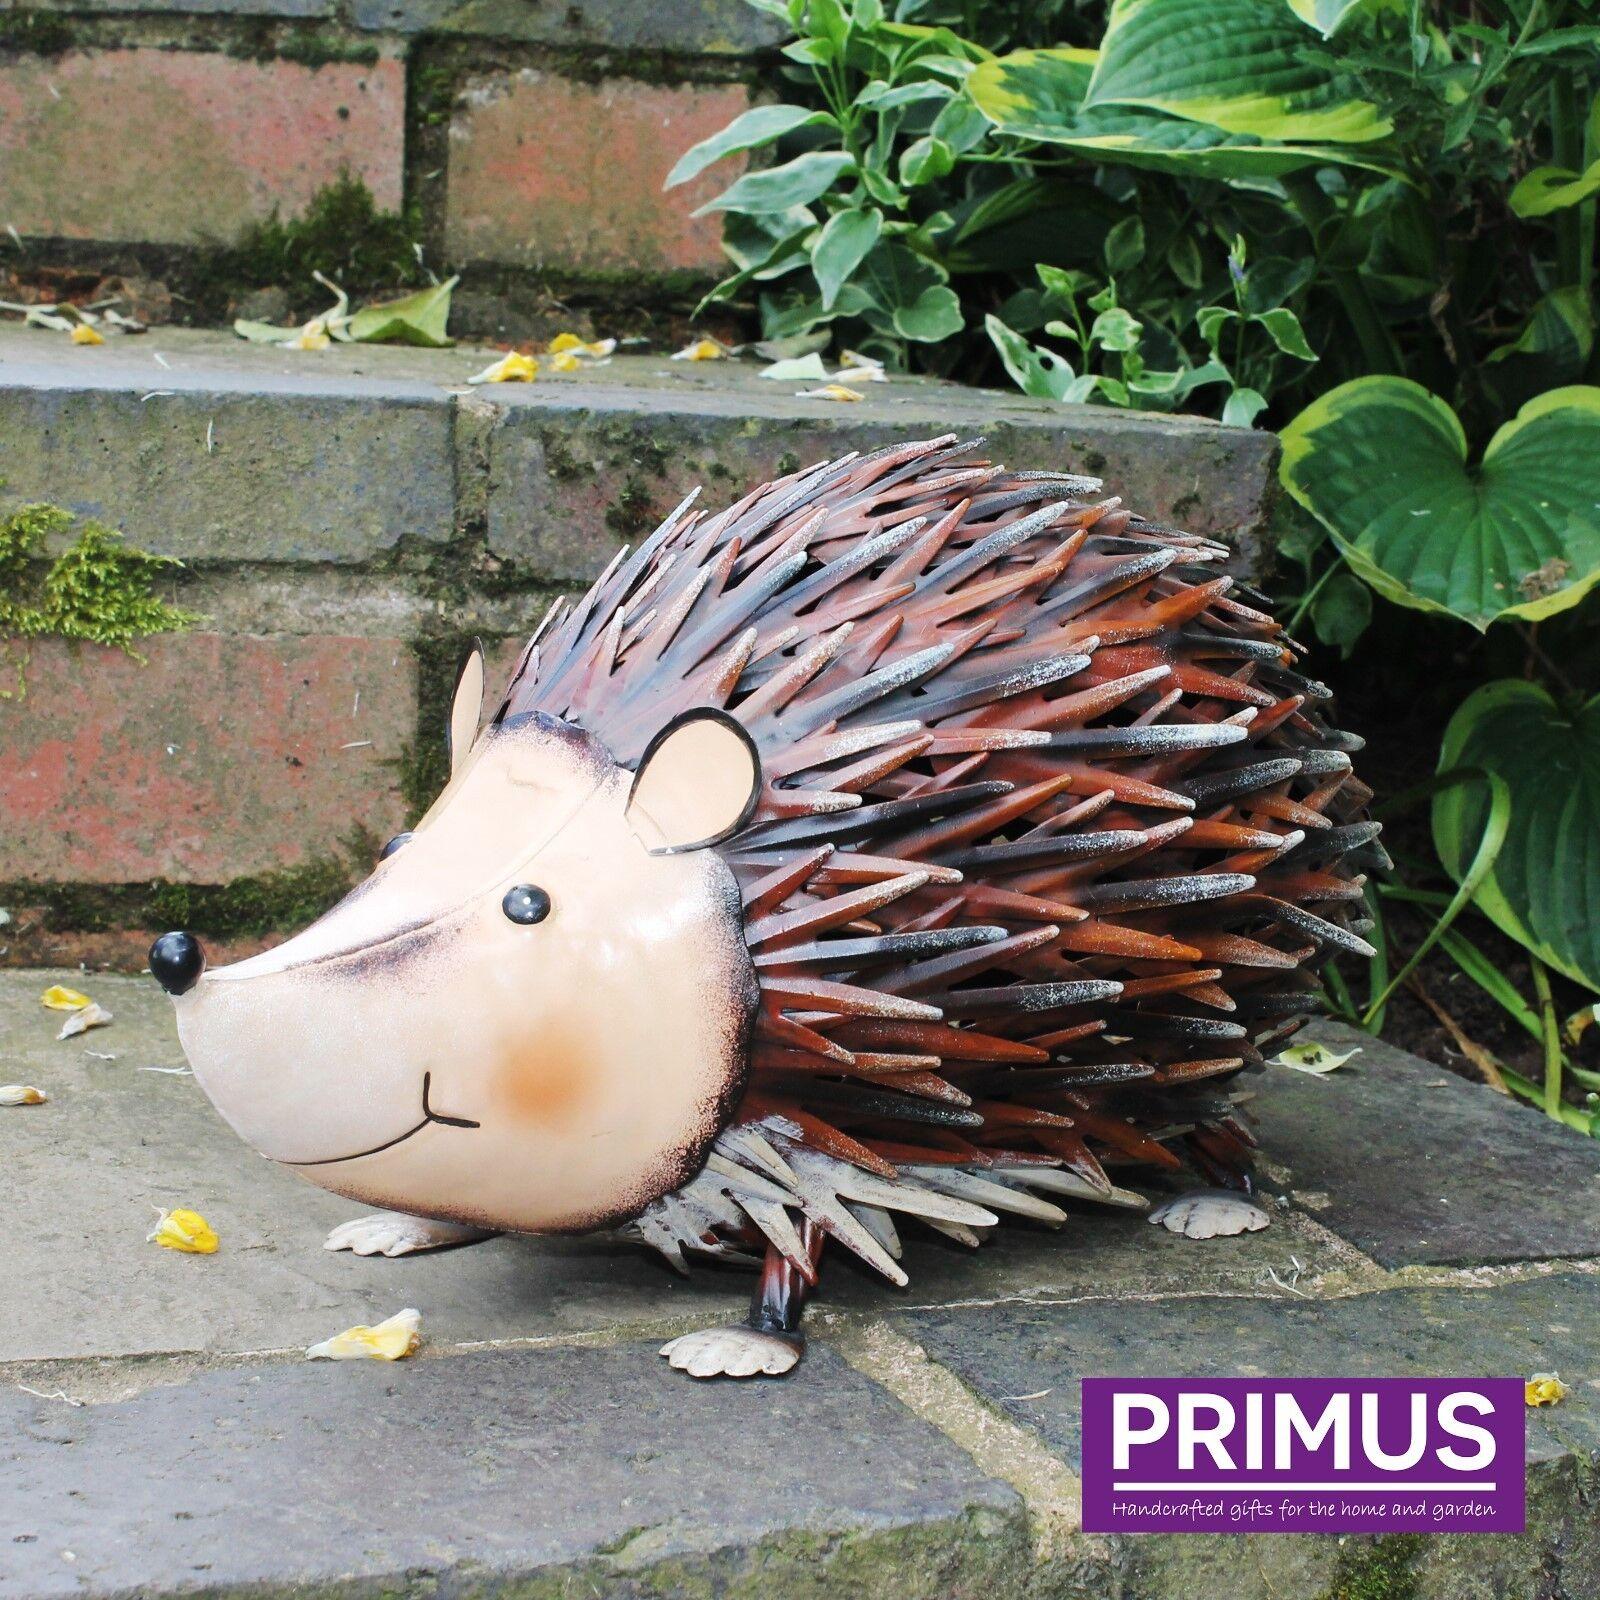 Primus Hand Crafted Rural Metal Tortoise Garden Ornament Animal Sculpture Gift